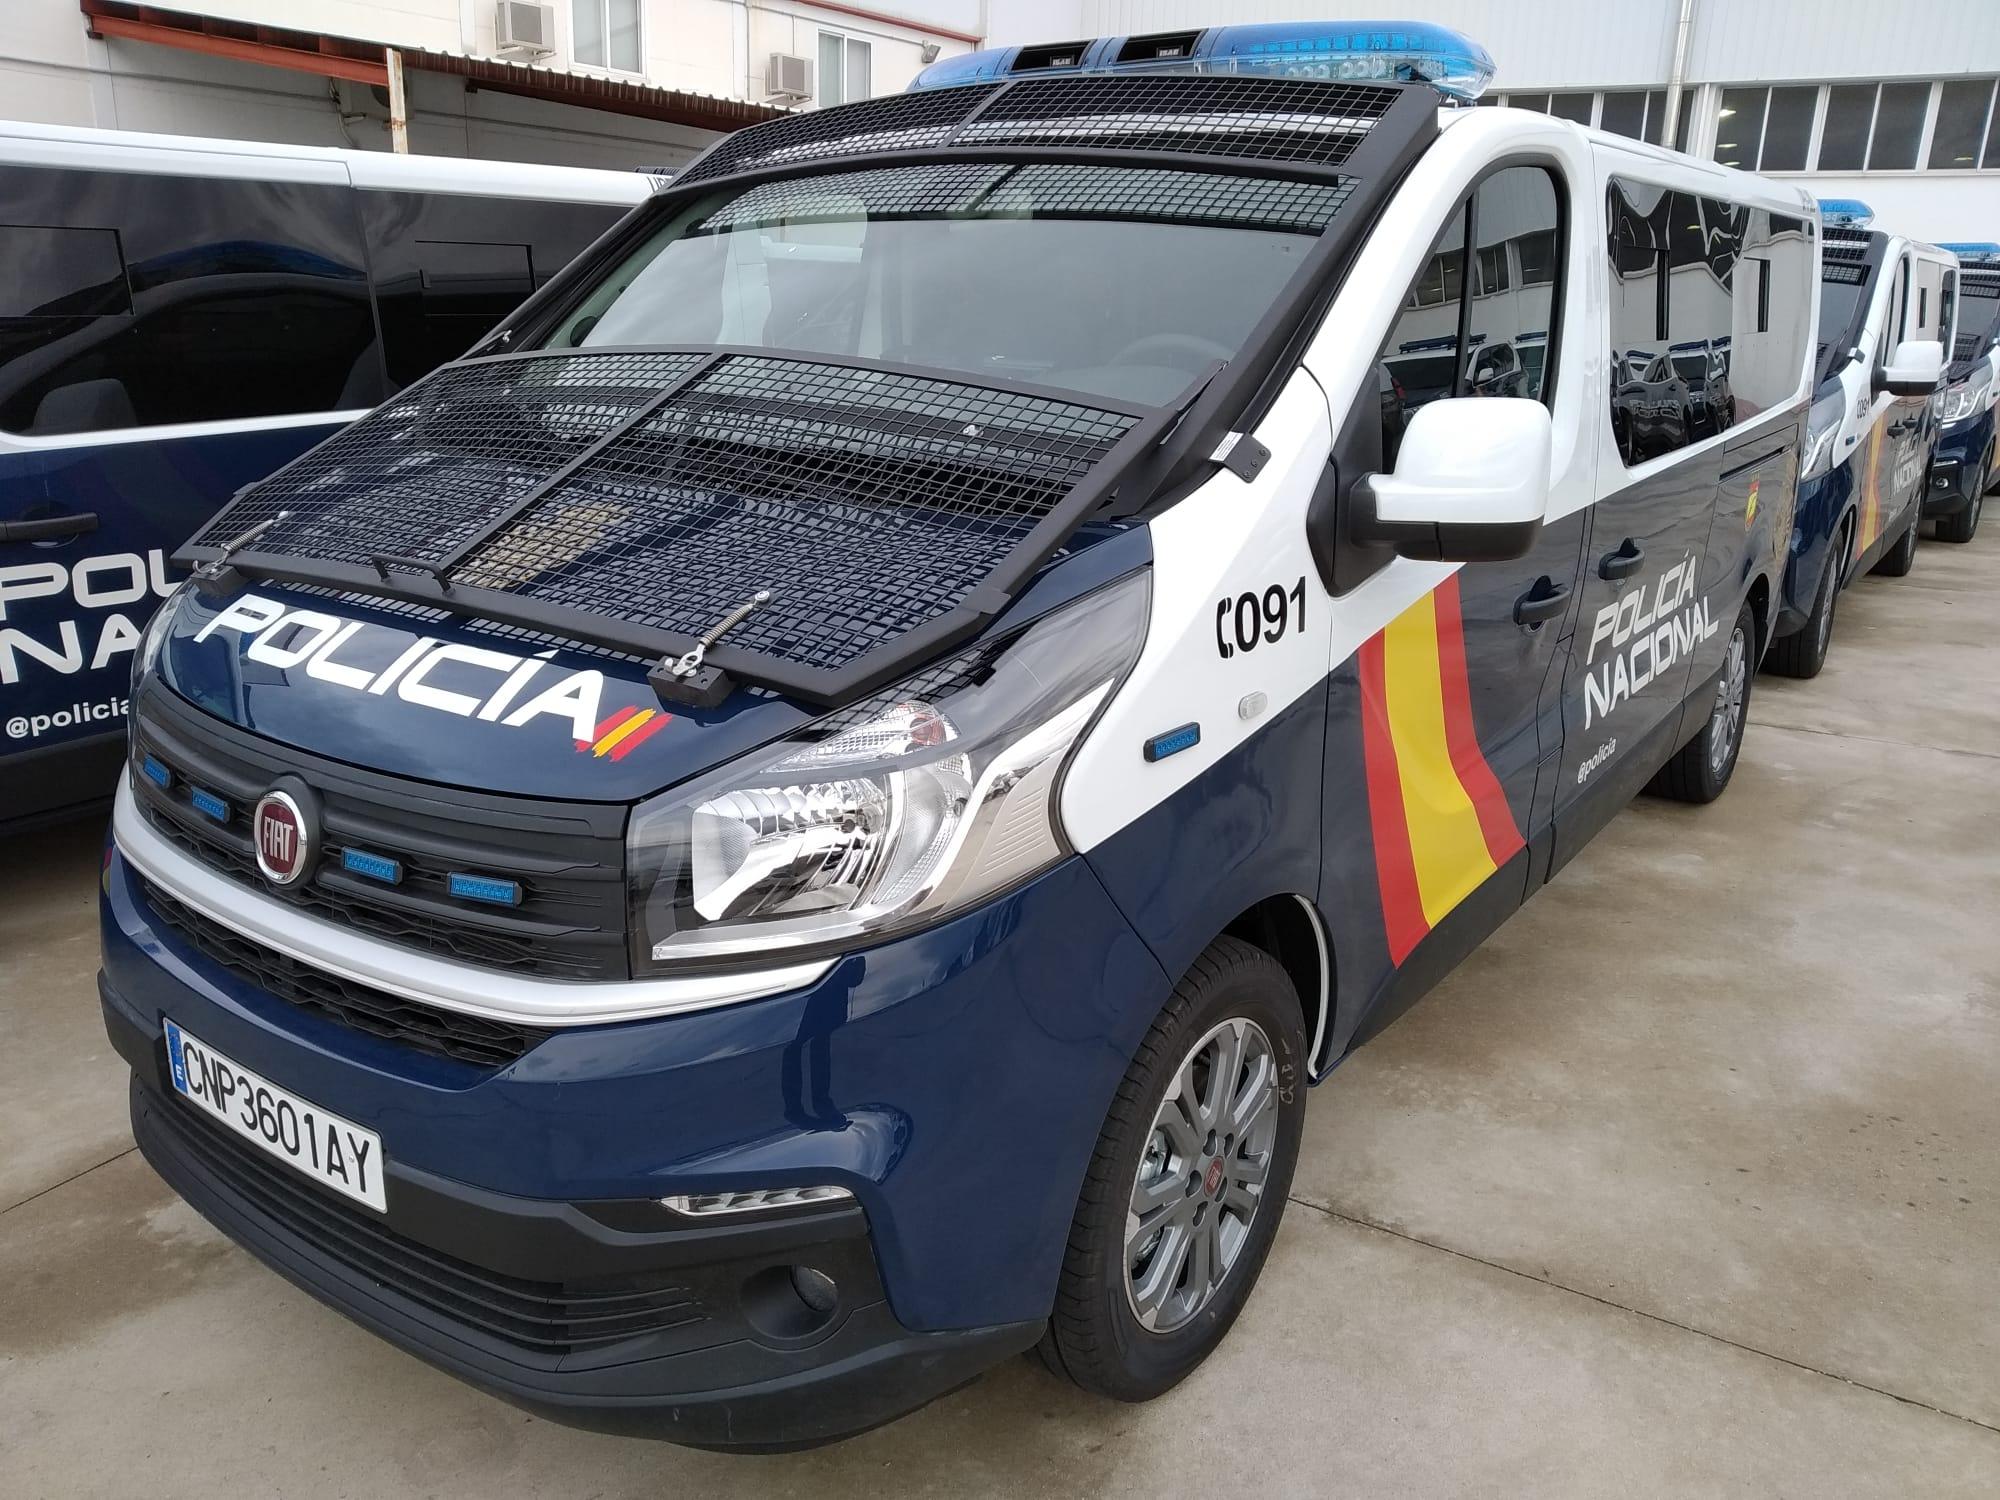 Fiat Talento Policia Nacional (2)